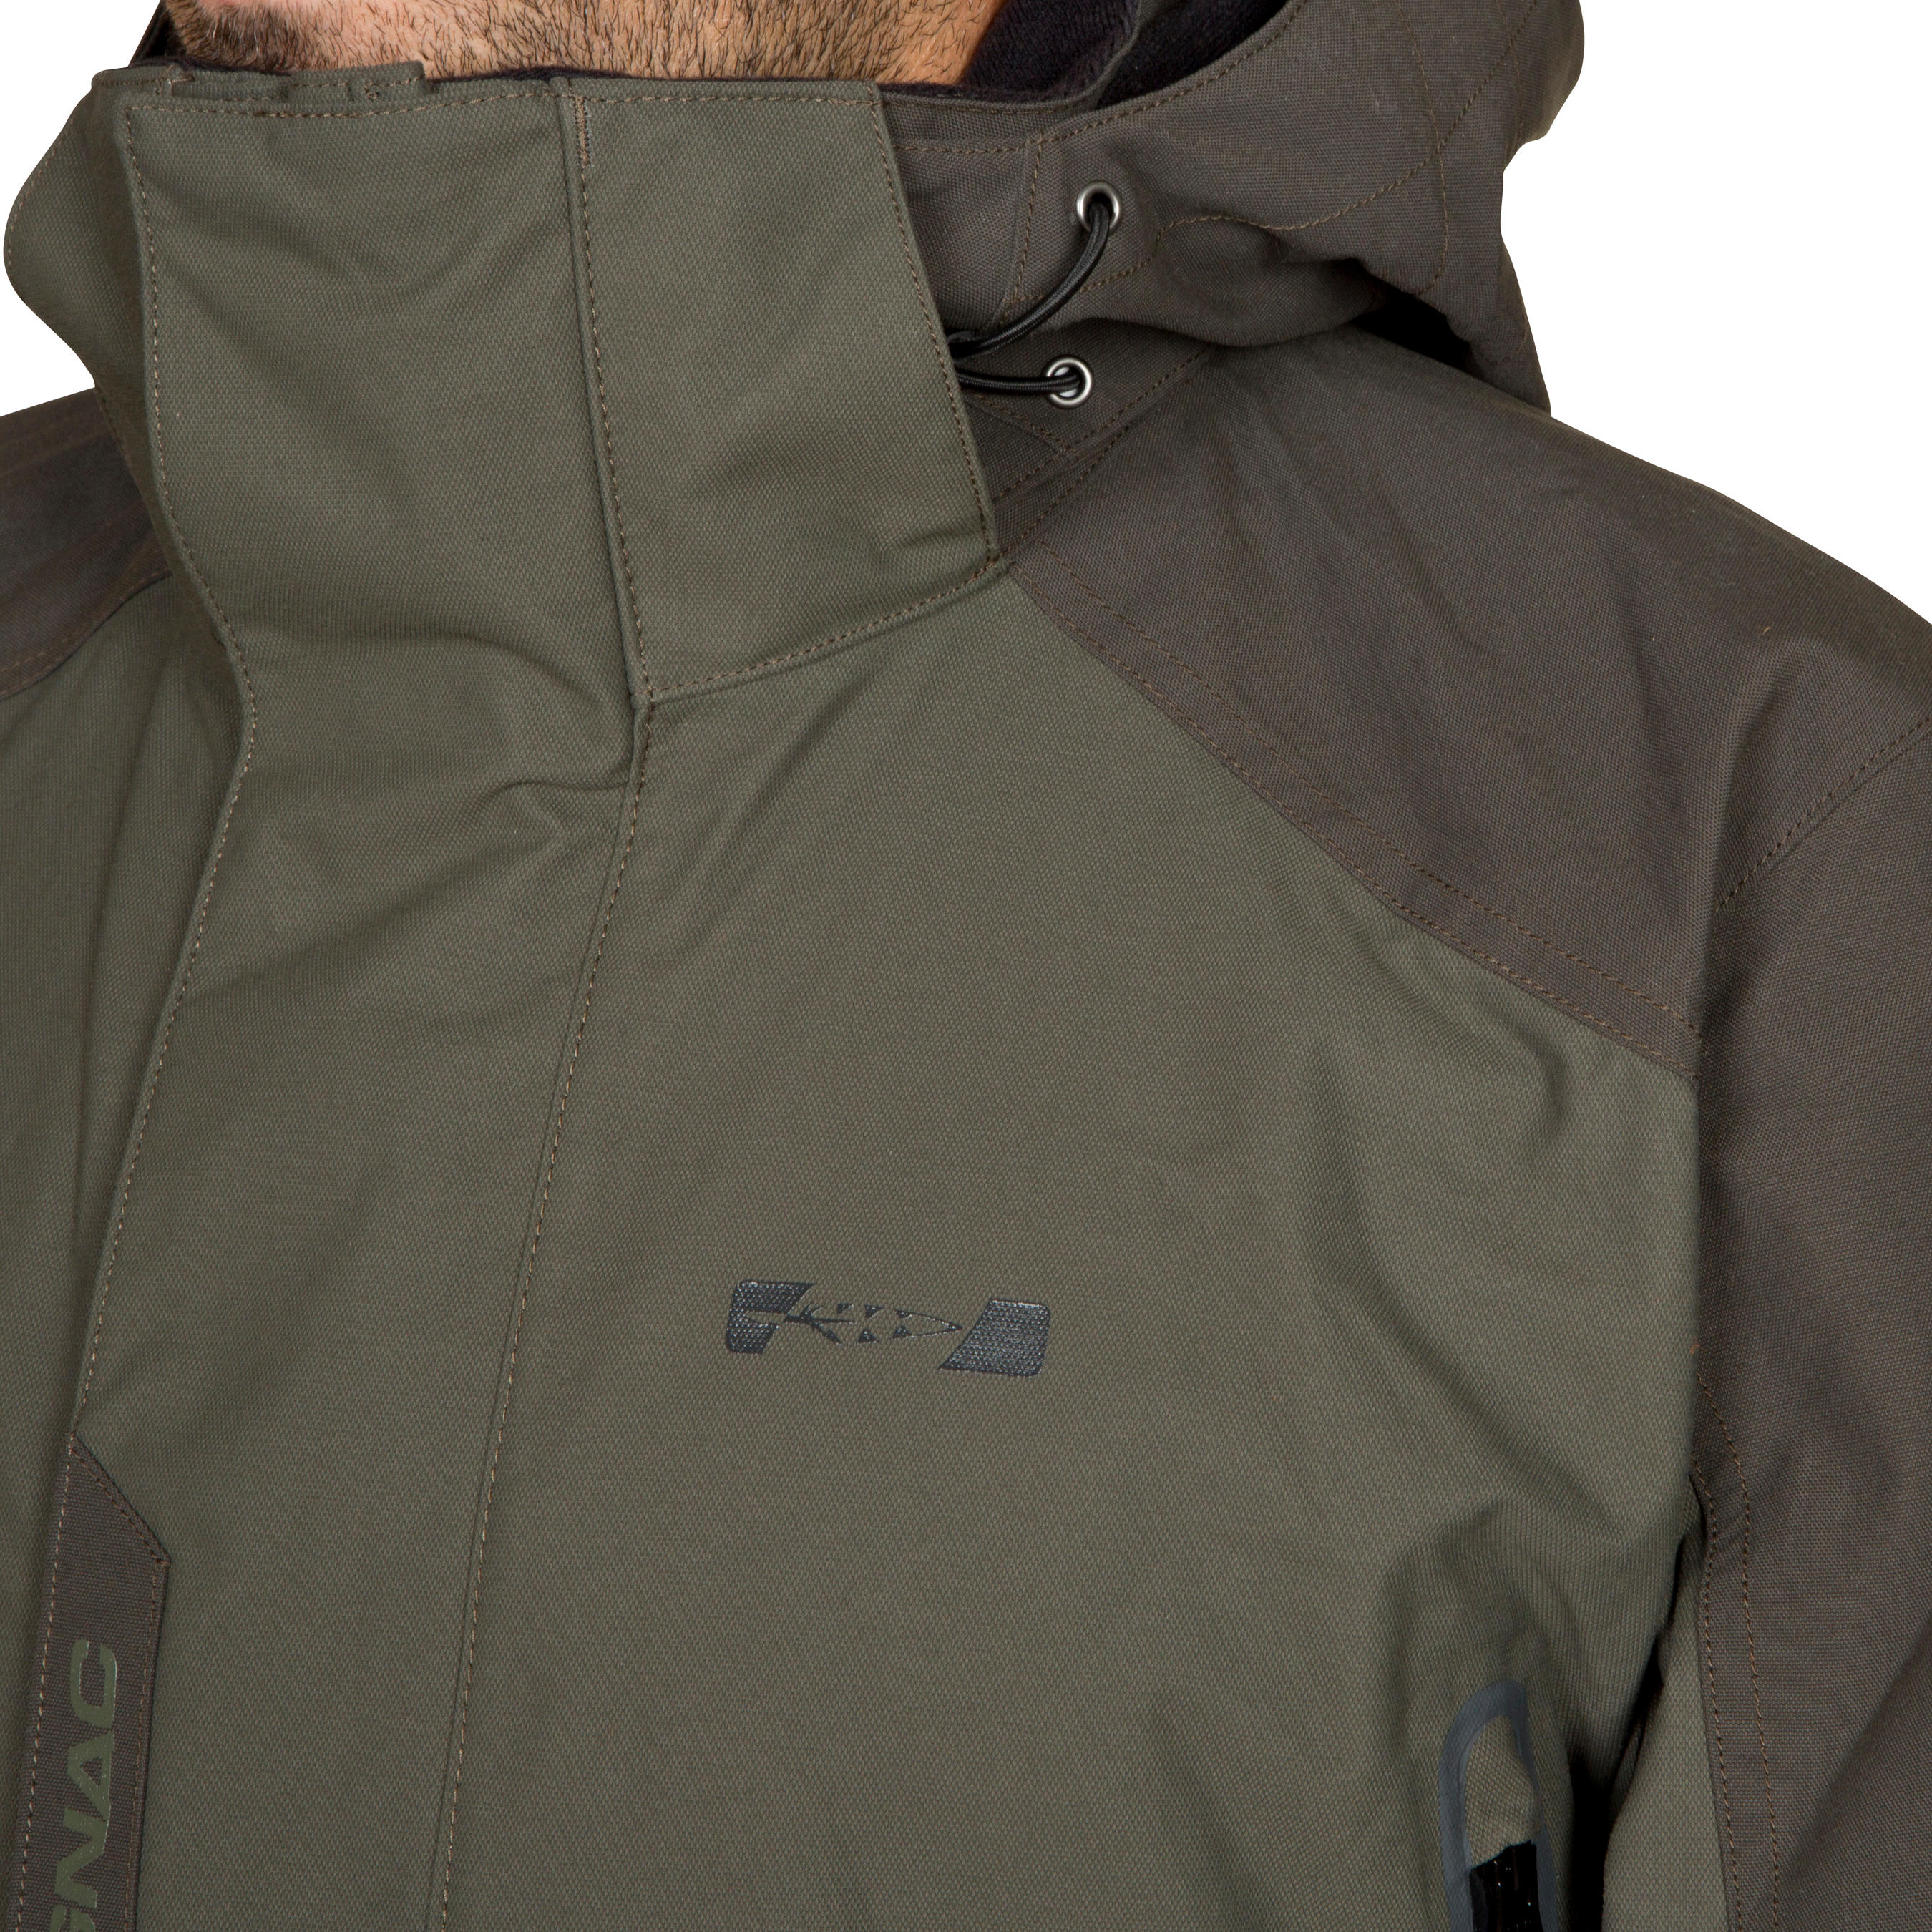 Veste chasse Inverness 500 imperméable verte